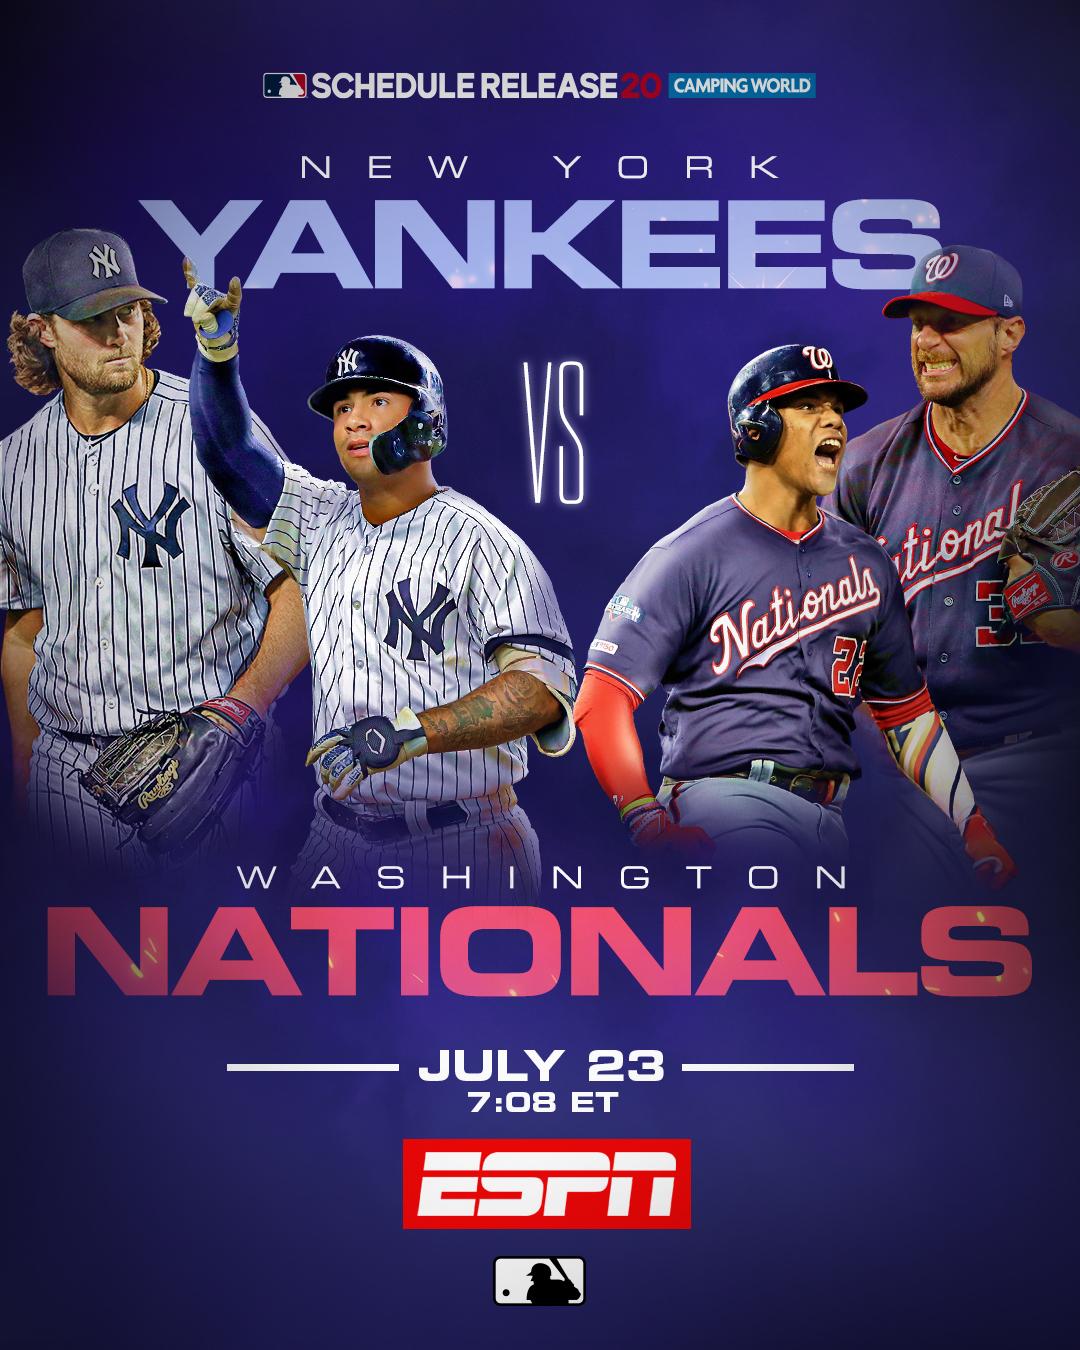 temporada MLB 2020